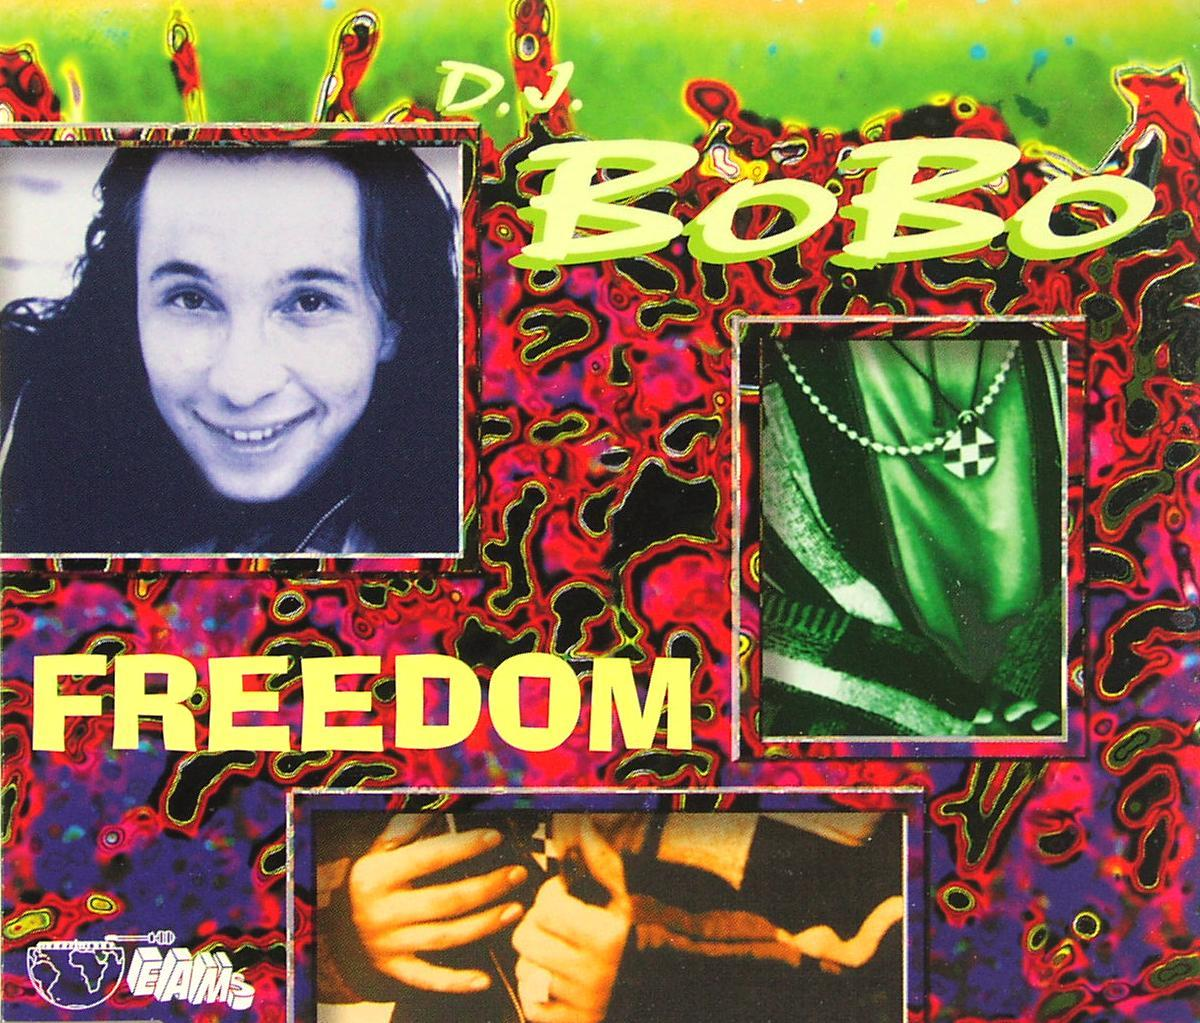 DJ Bobo - Freedom [CD-Single]